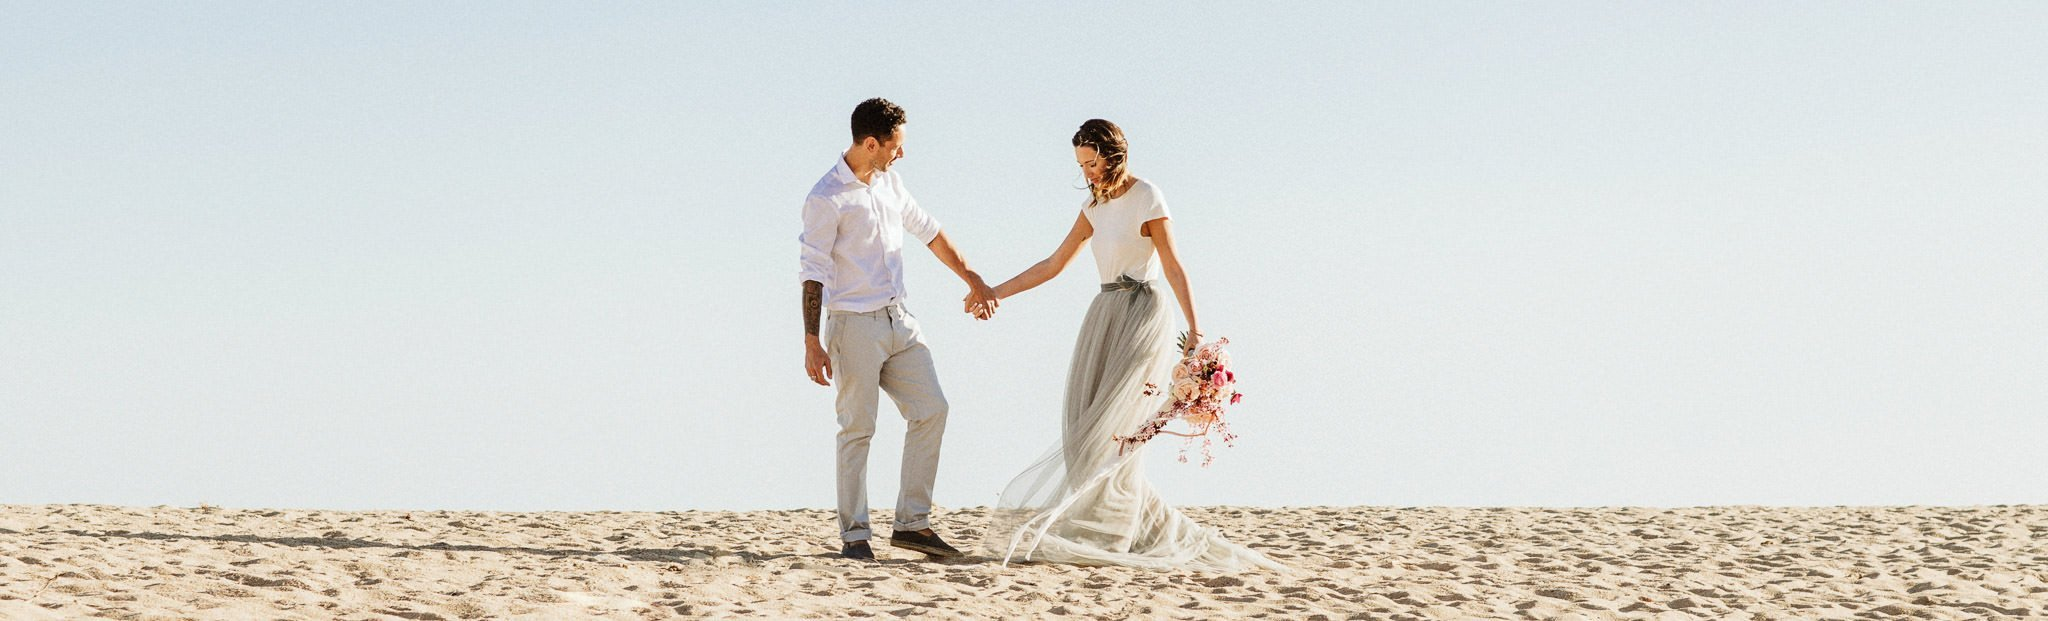 Pedro Talens fotógrafo de bodas en valencia